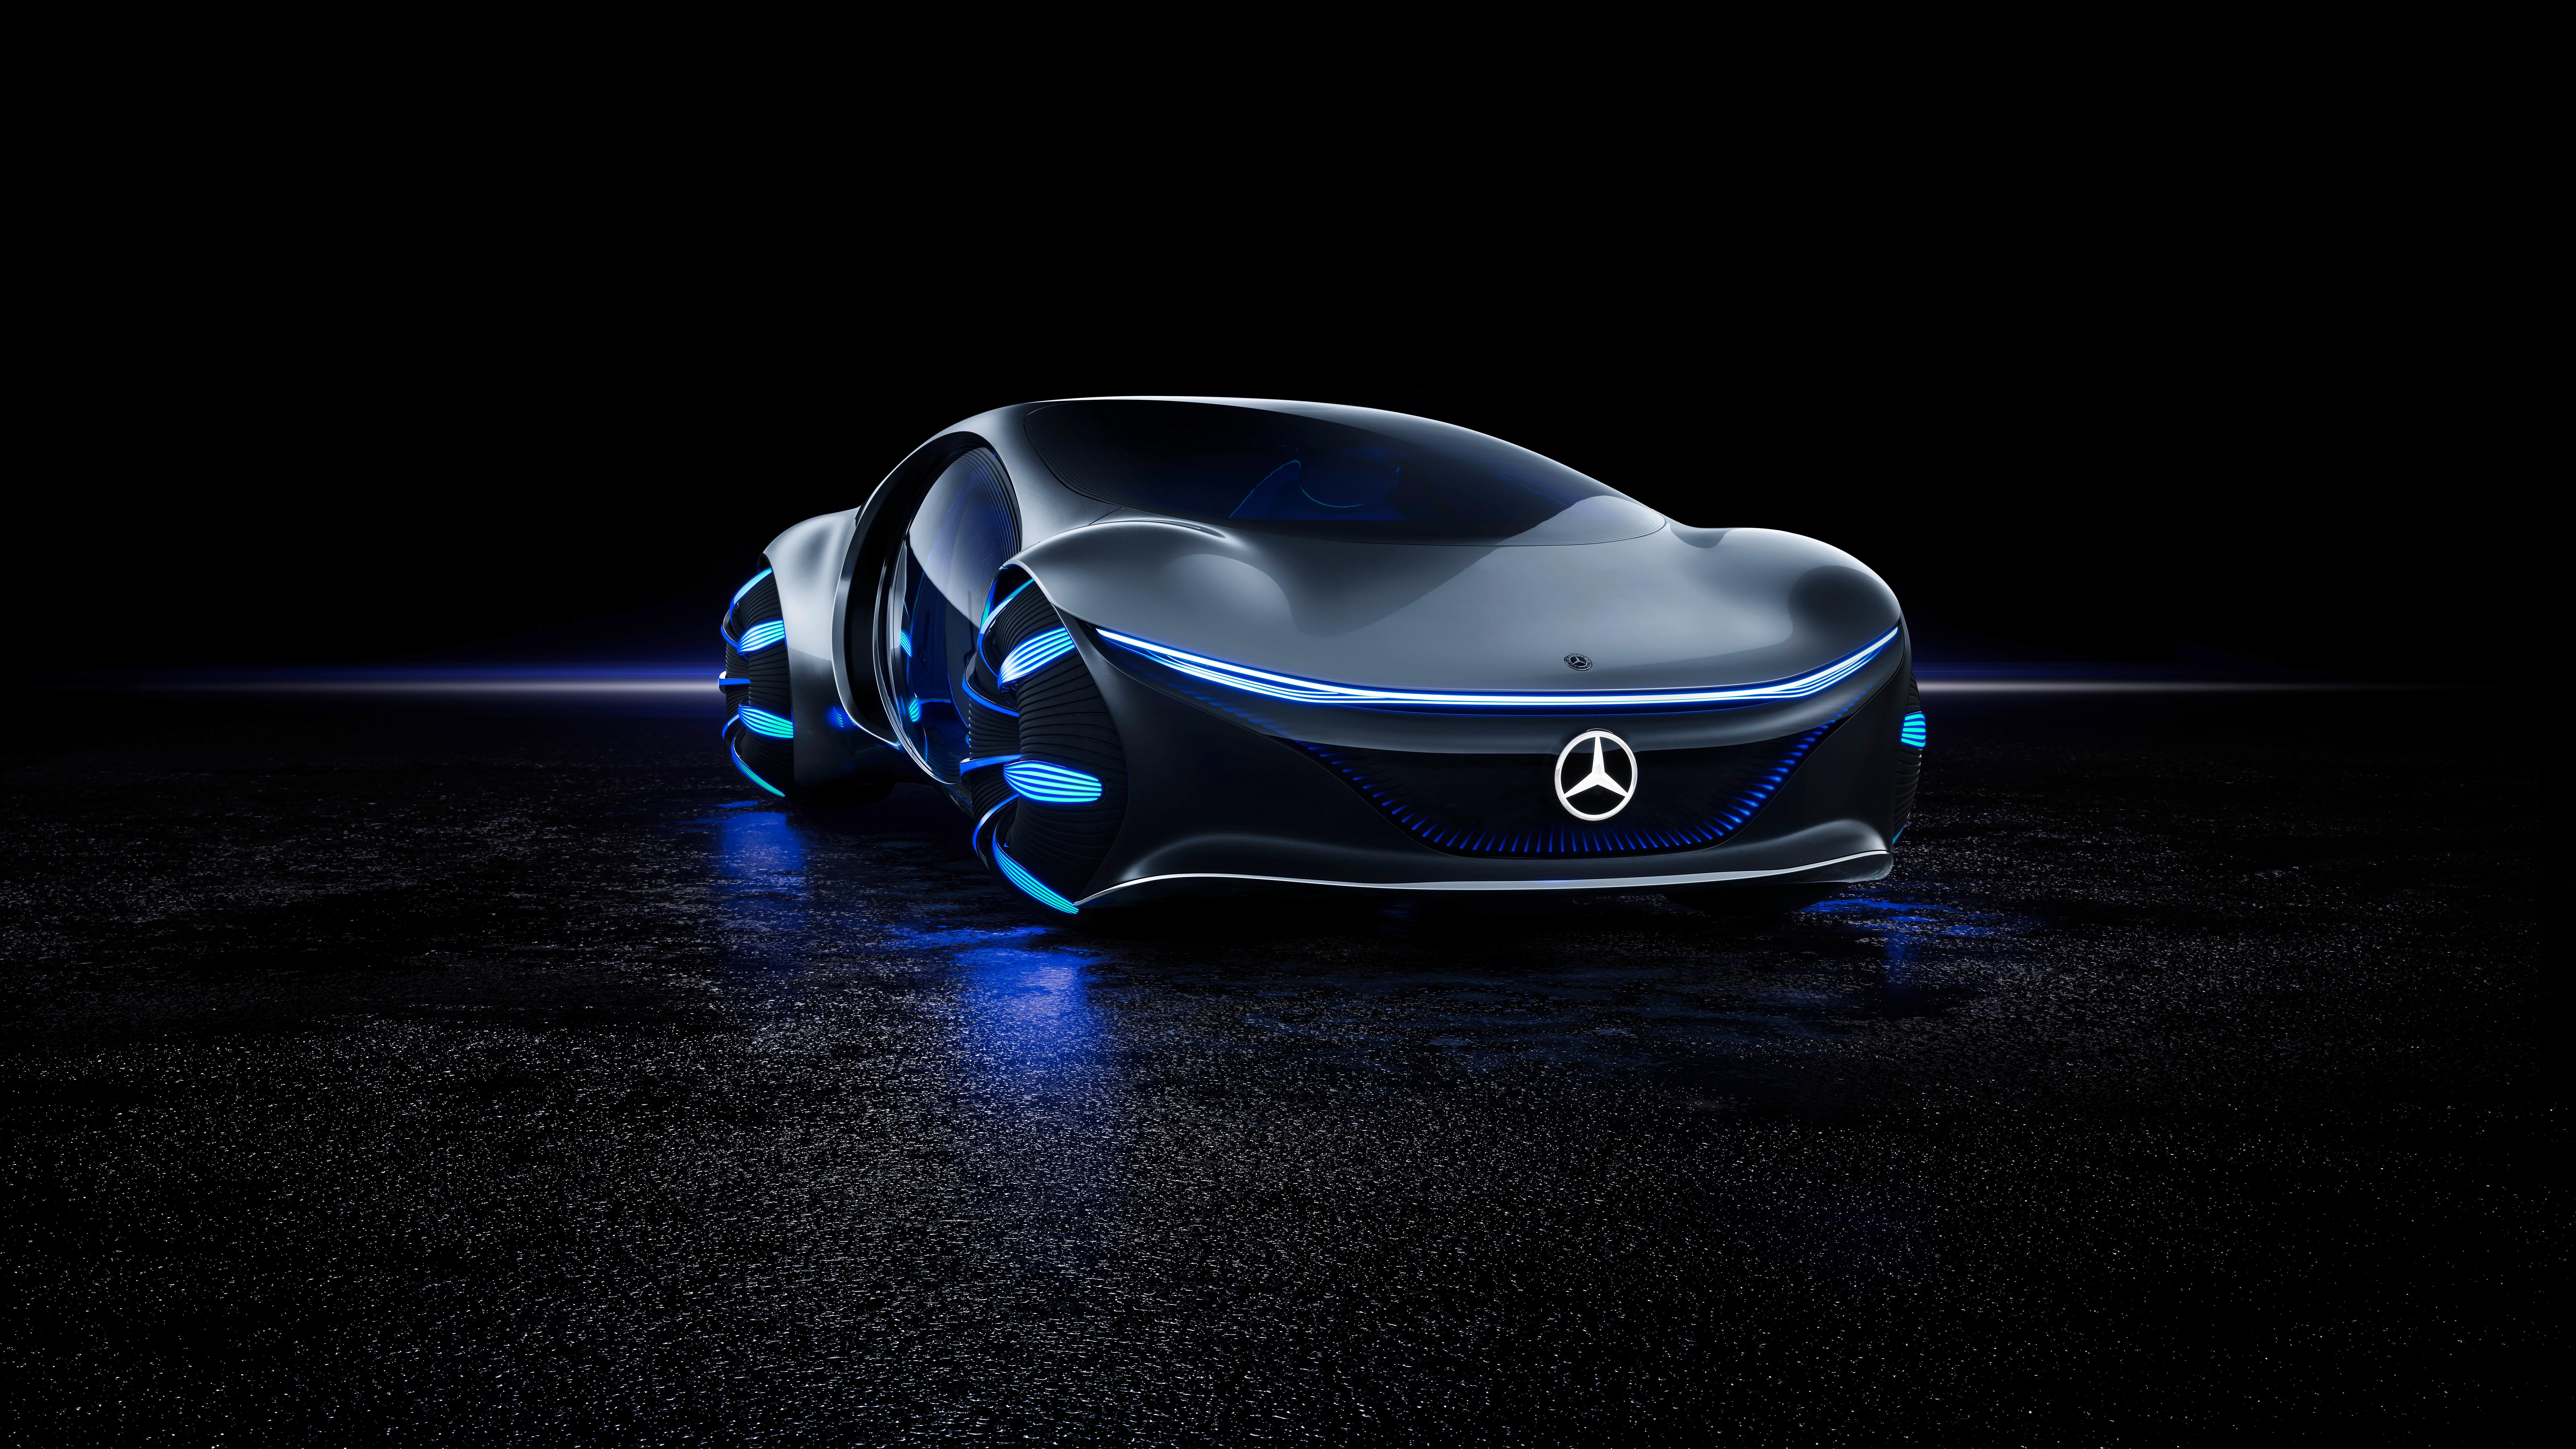 Mercedes Benz VISION AVTR 2020 4K 8K 4 Wallpaper HD Car 7680x4320